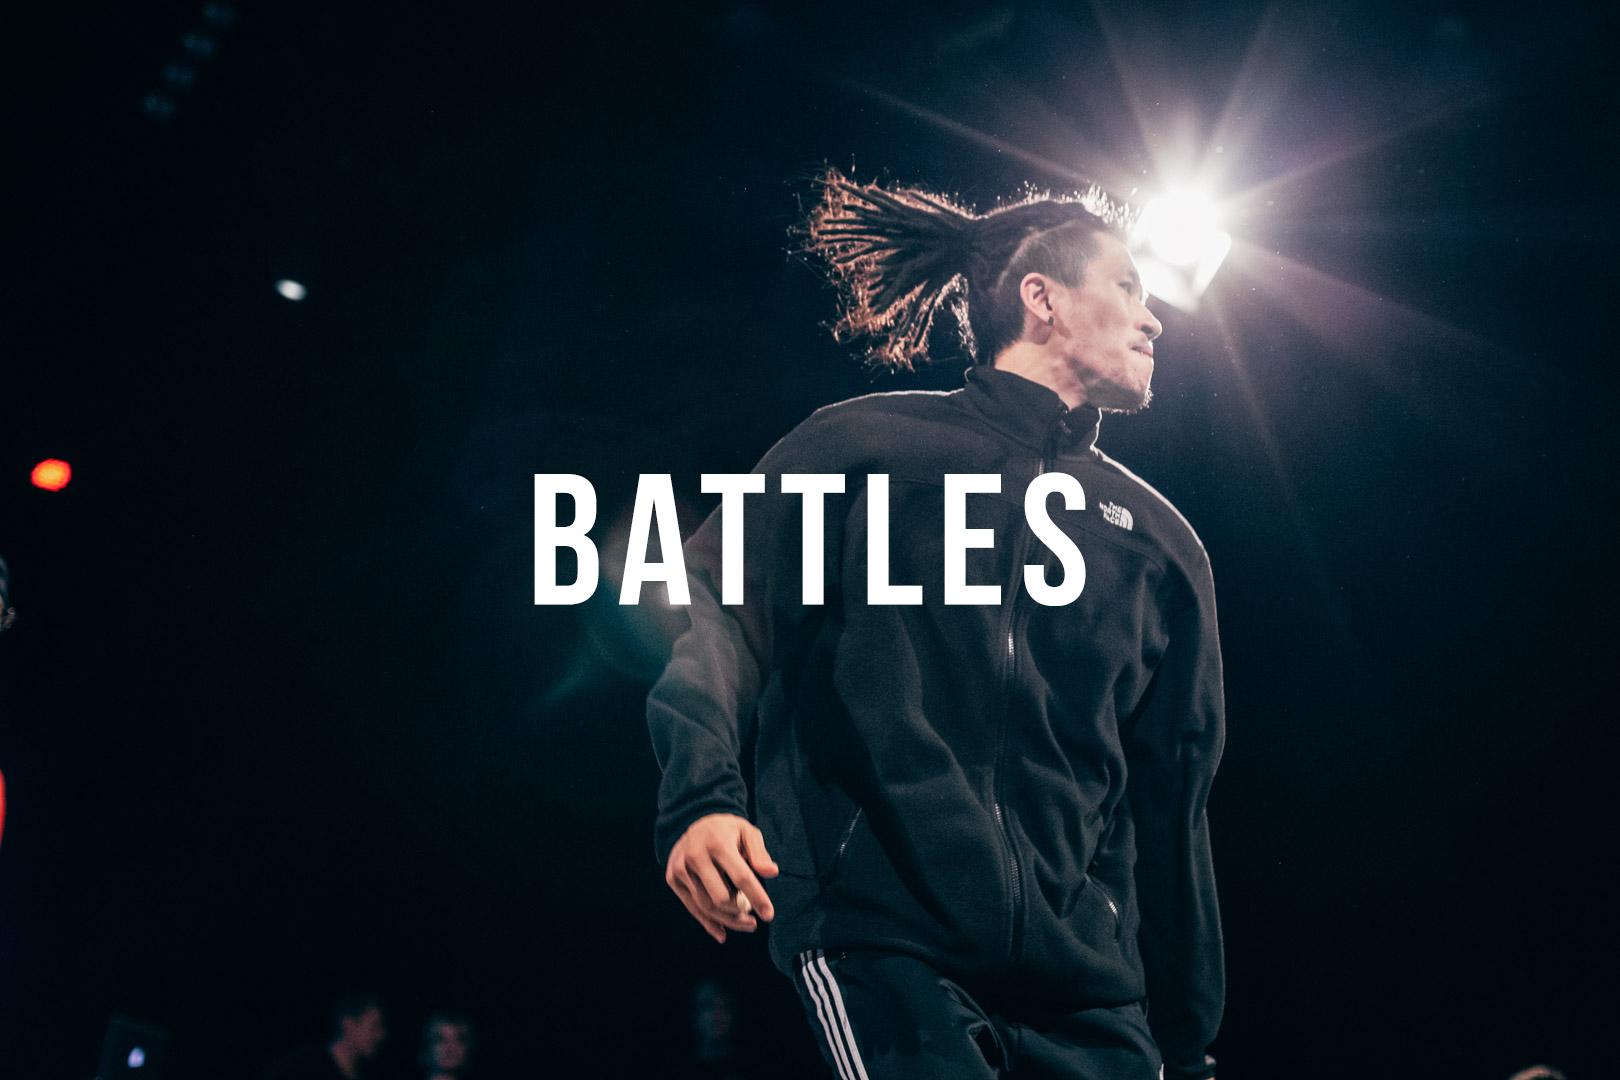 battles thumb.jpg